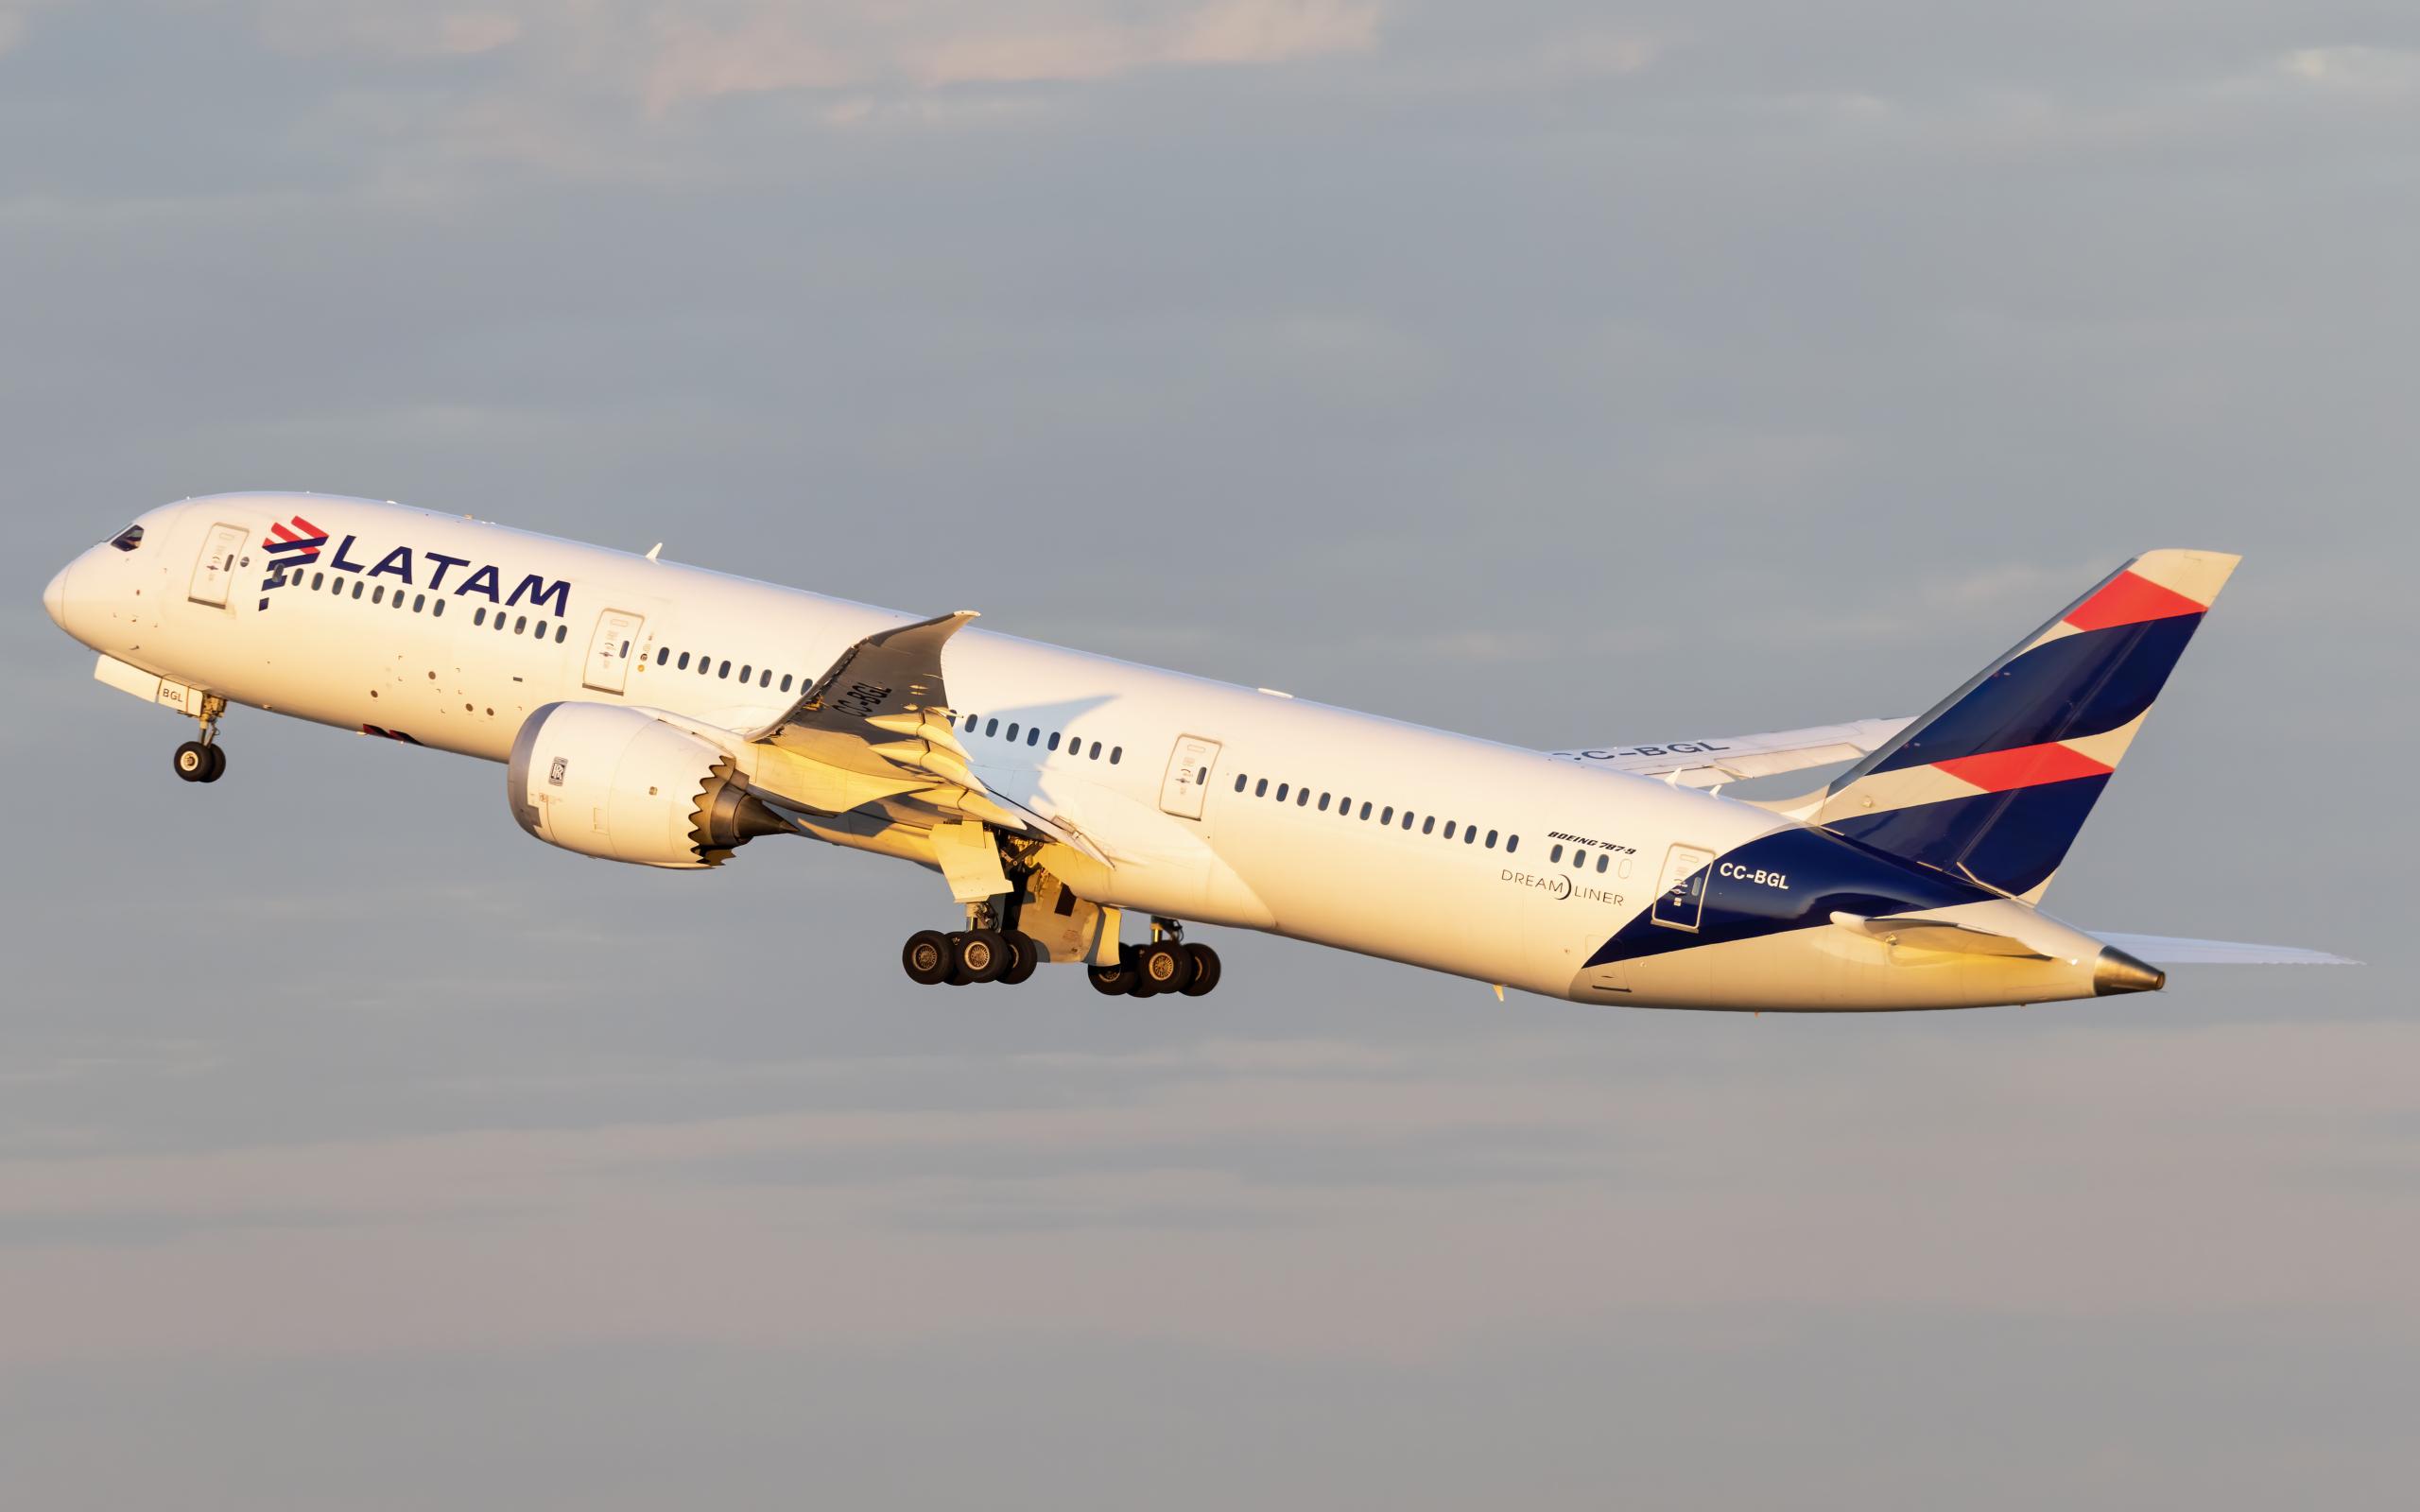 LATAM Confirms Plans To Relaunch 787 Sydney Flights Via Auckland